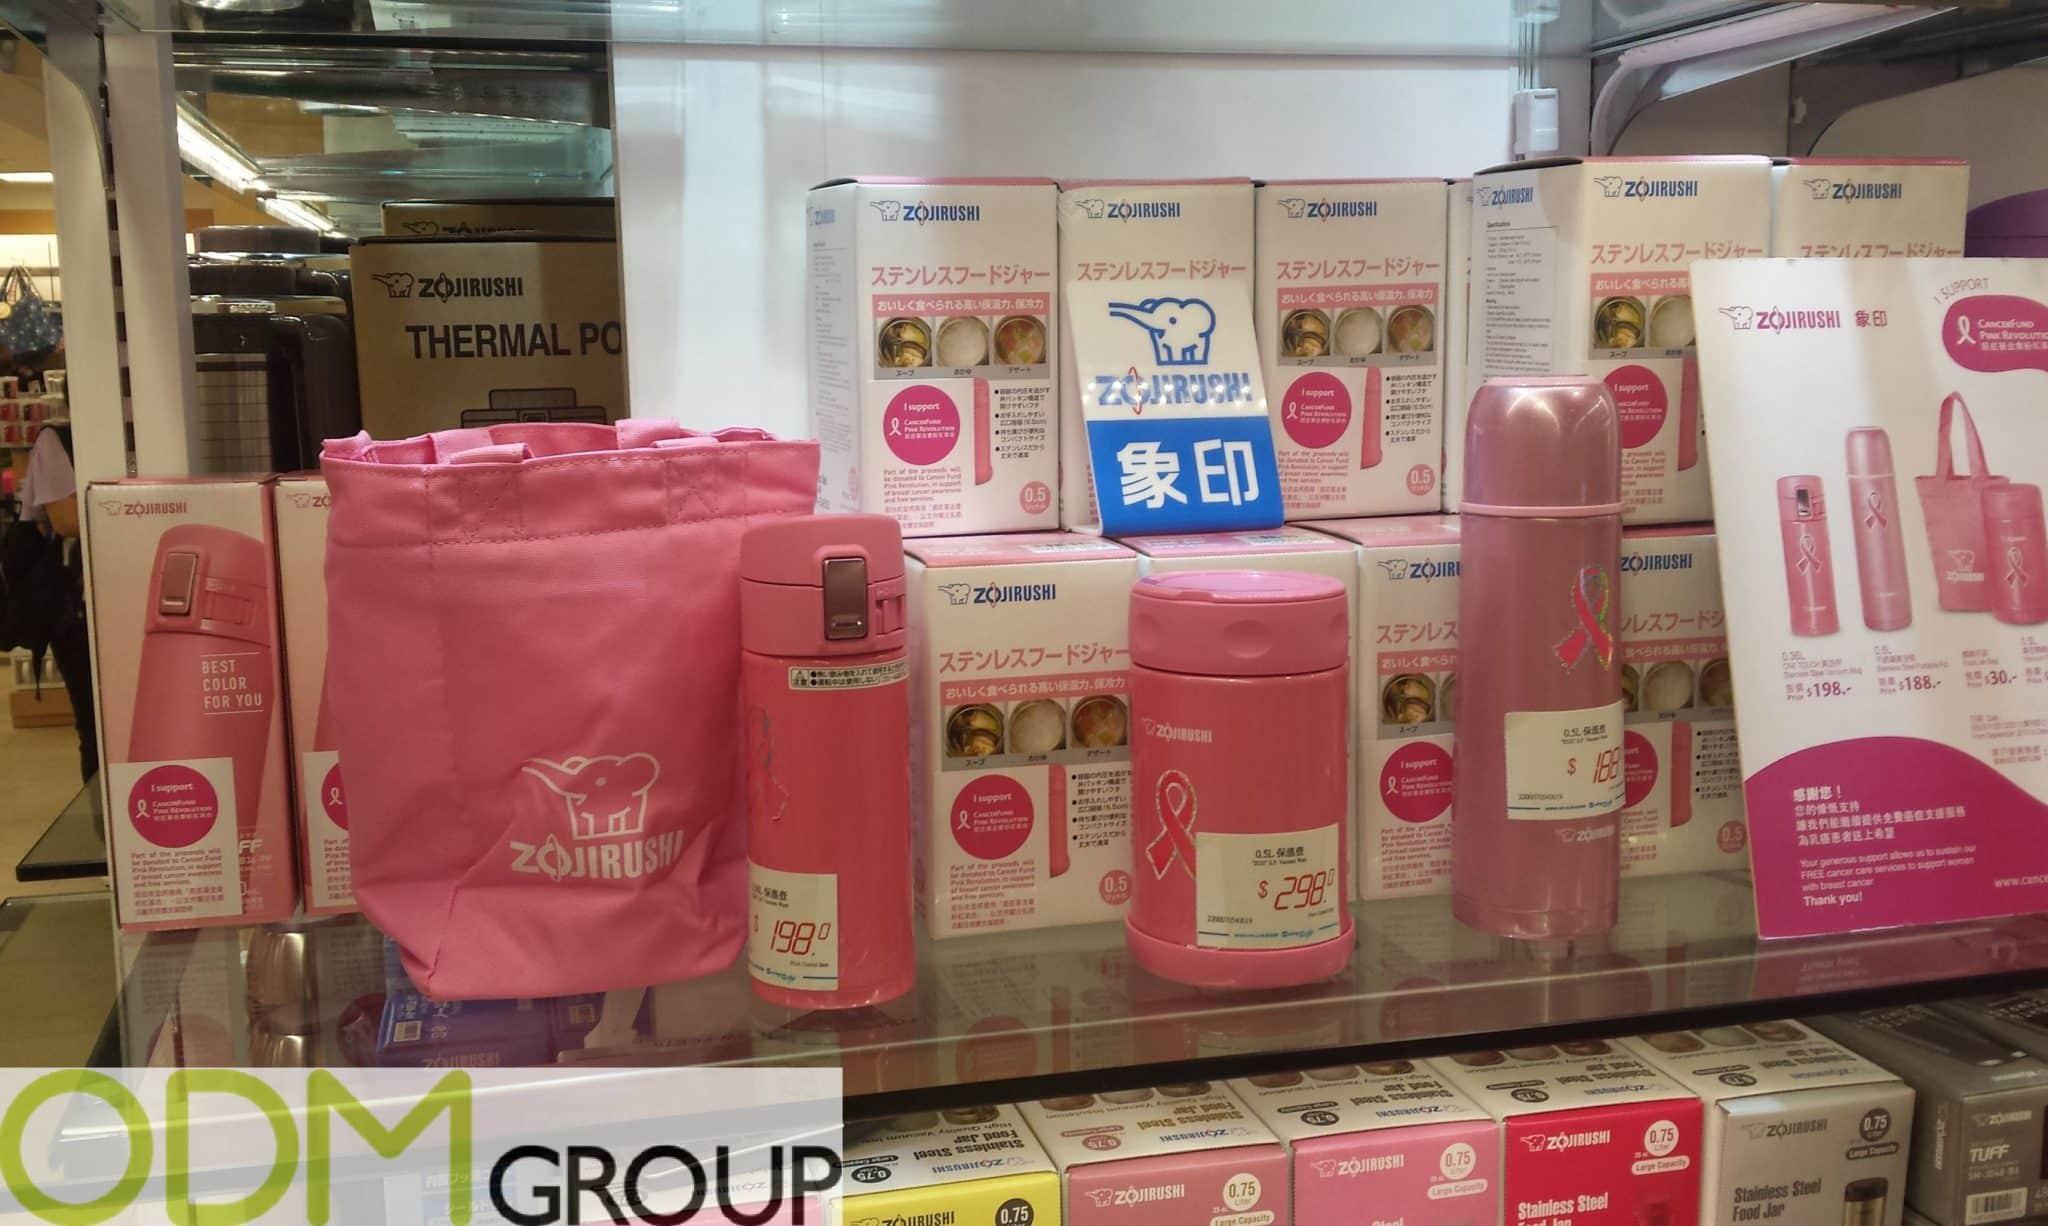 Branded Thermal Set for Promoting Cancer Awareness